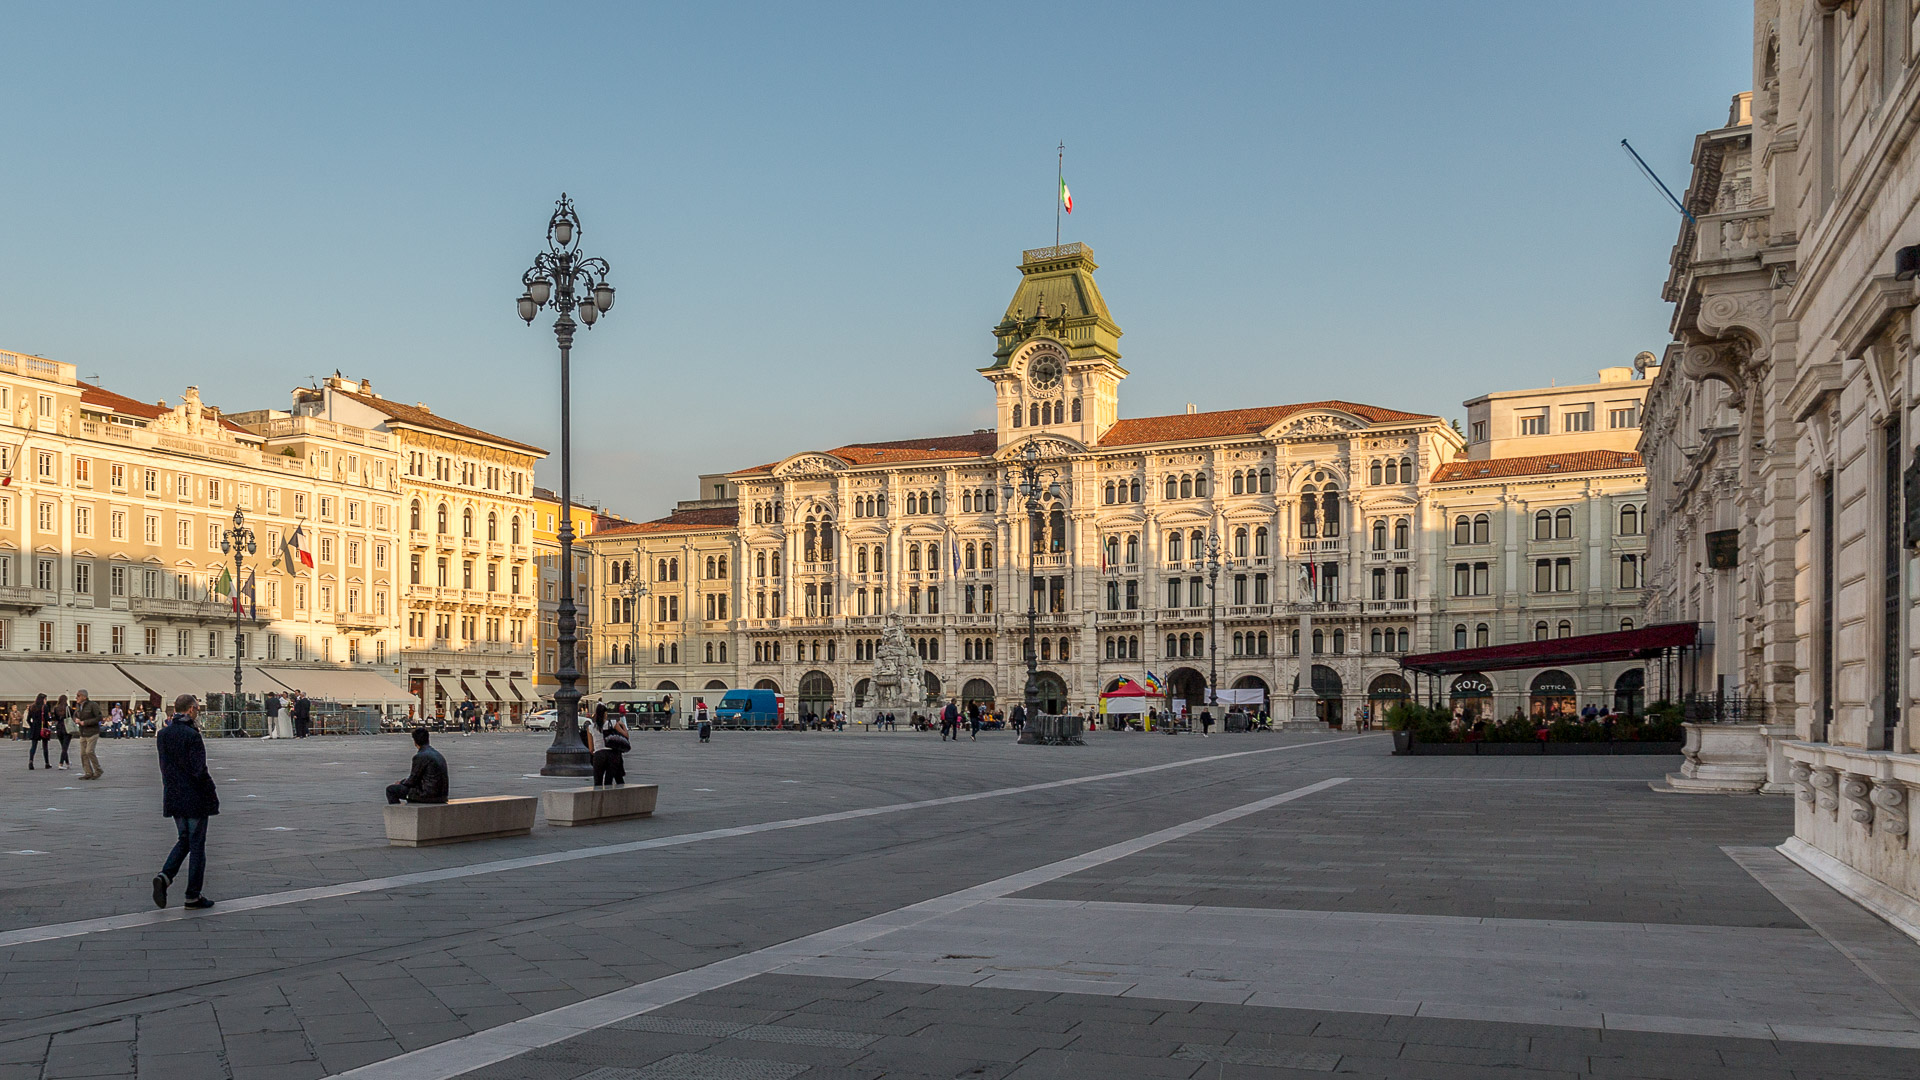 Piazza dell'Unità d'Italia mit dem großen Rathaus am Ende